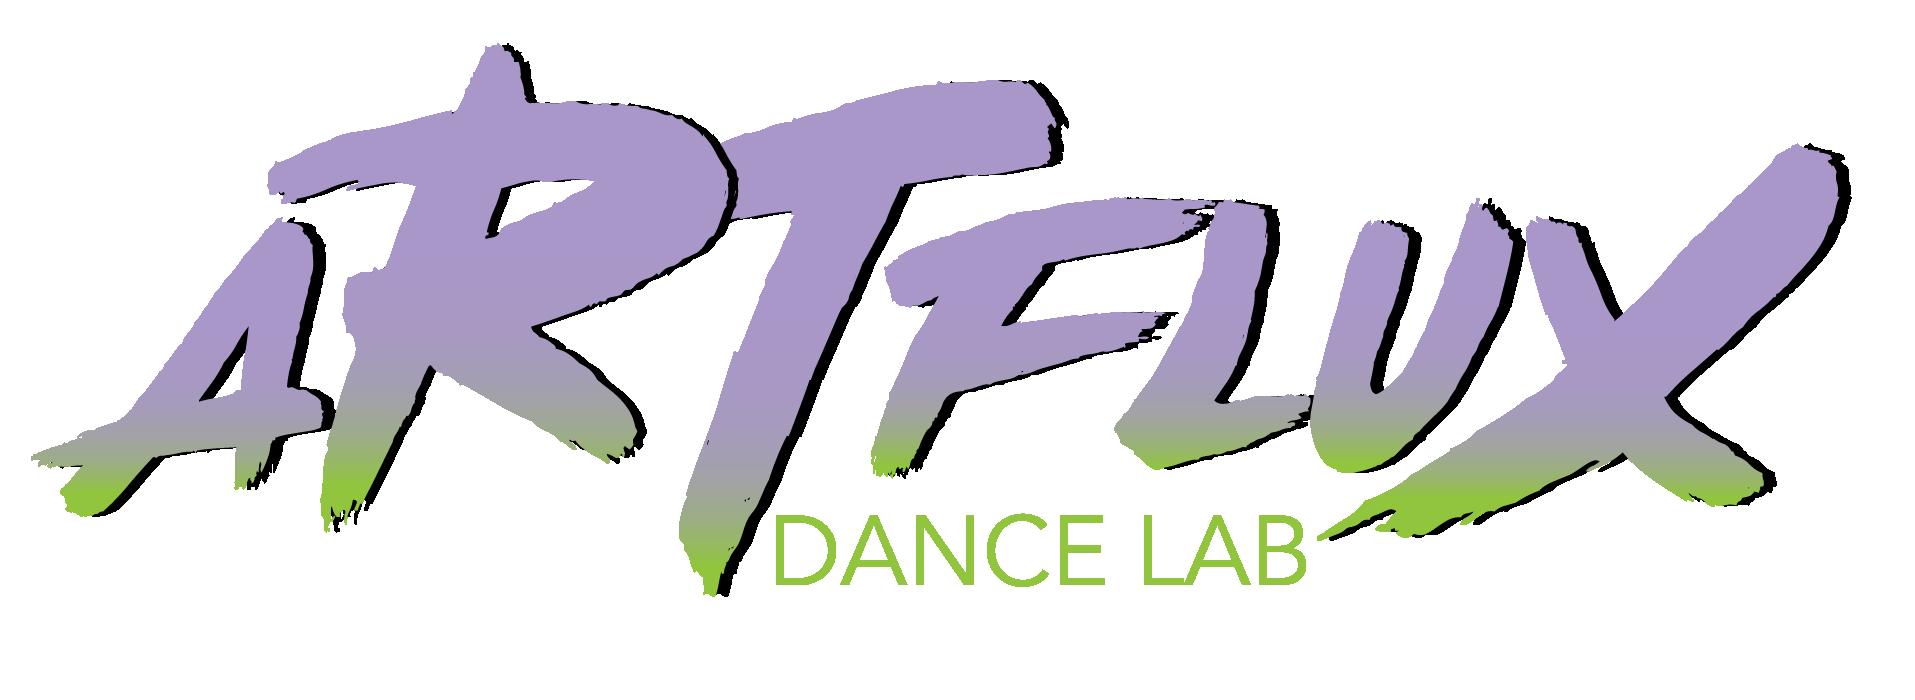 Artflux Dance Lab logo